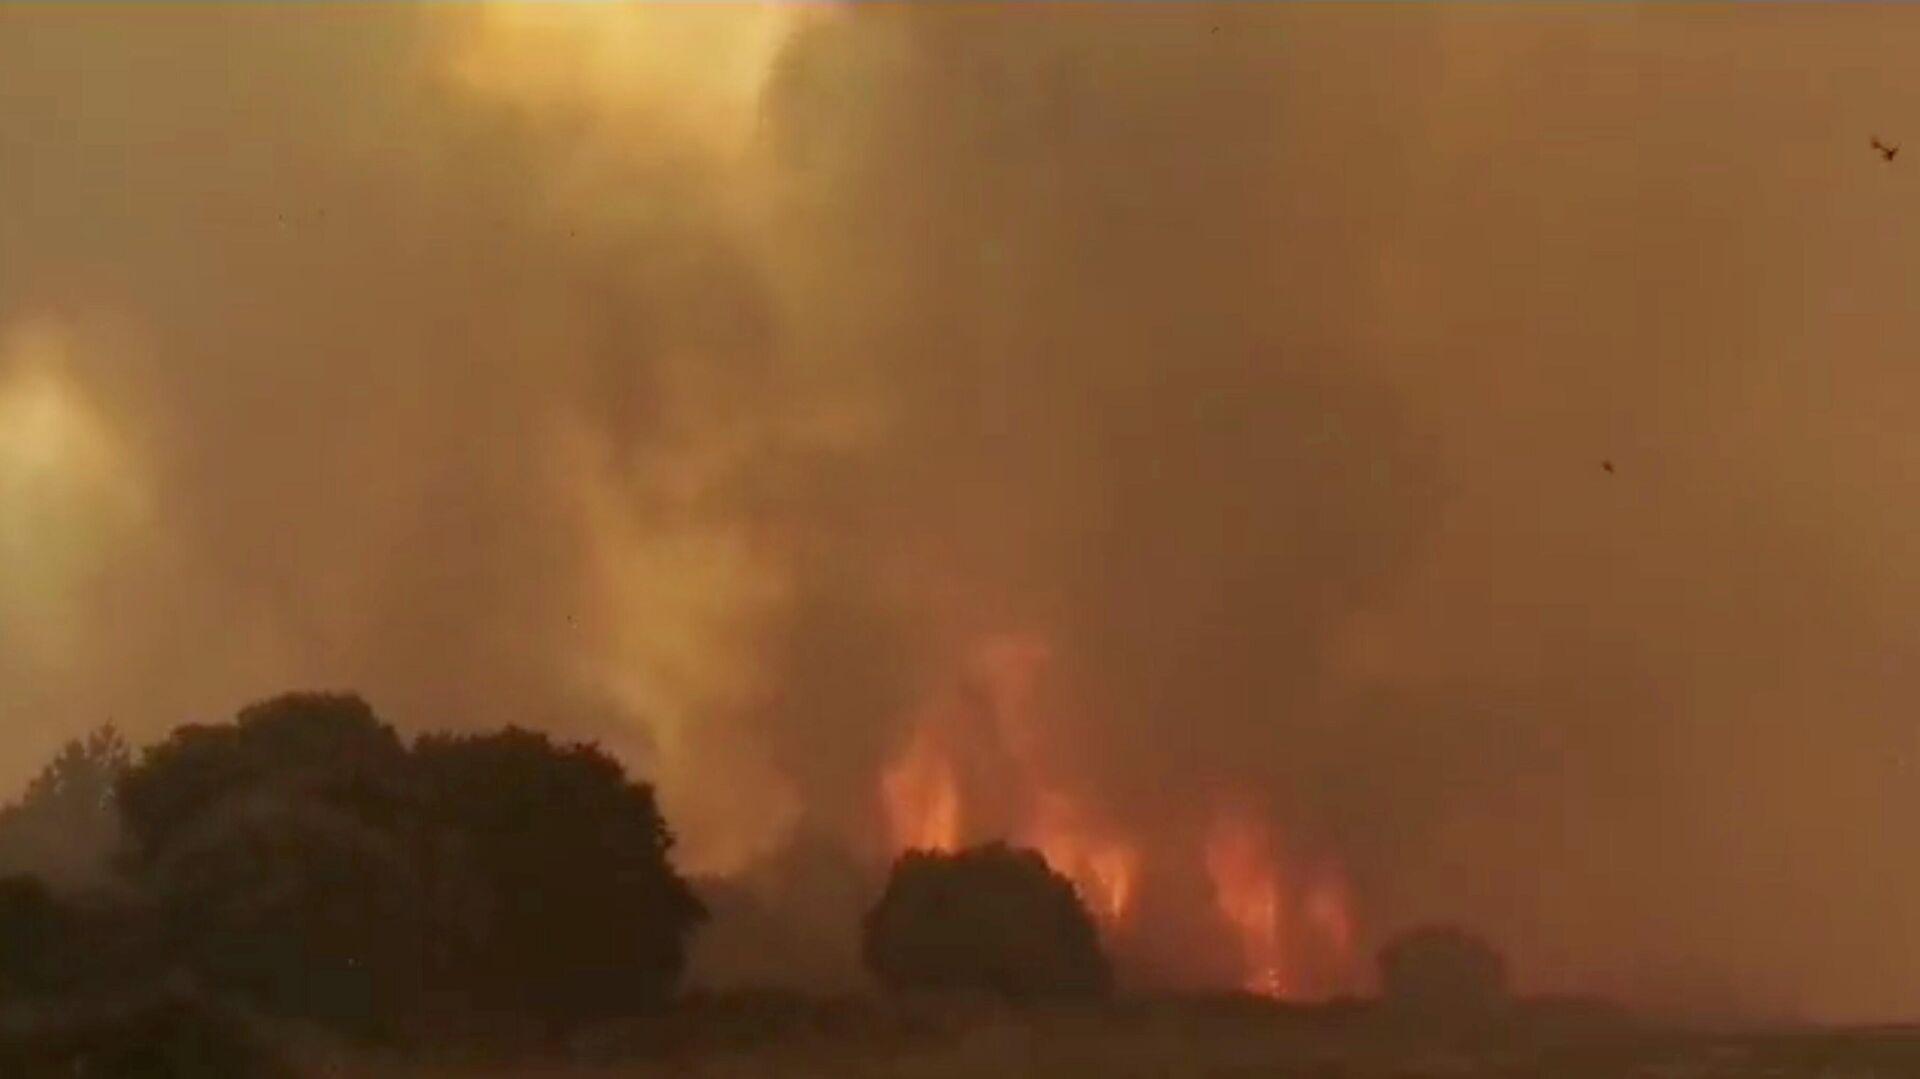 Incendios forestales en Italia - Sputnik Mundo, 1920, 26.07.2021